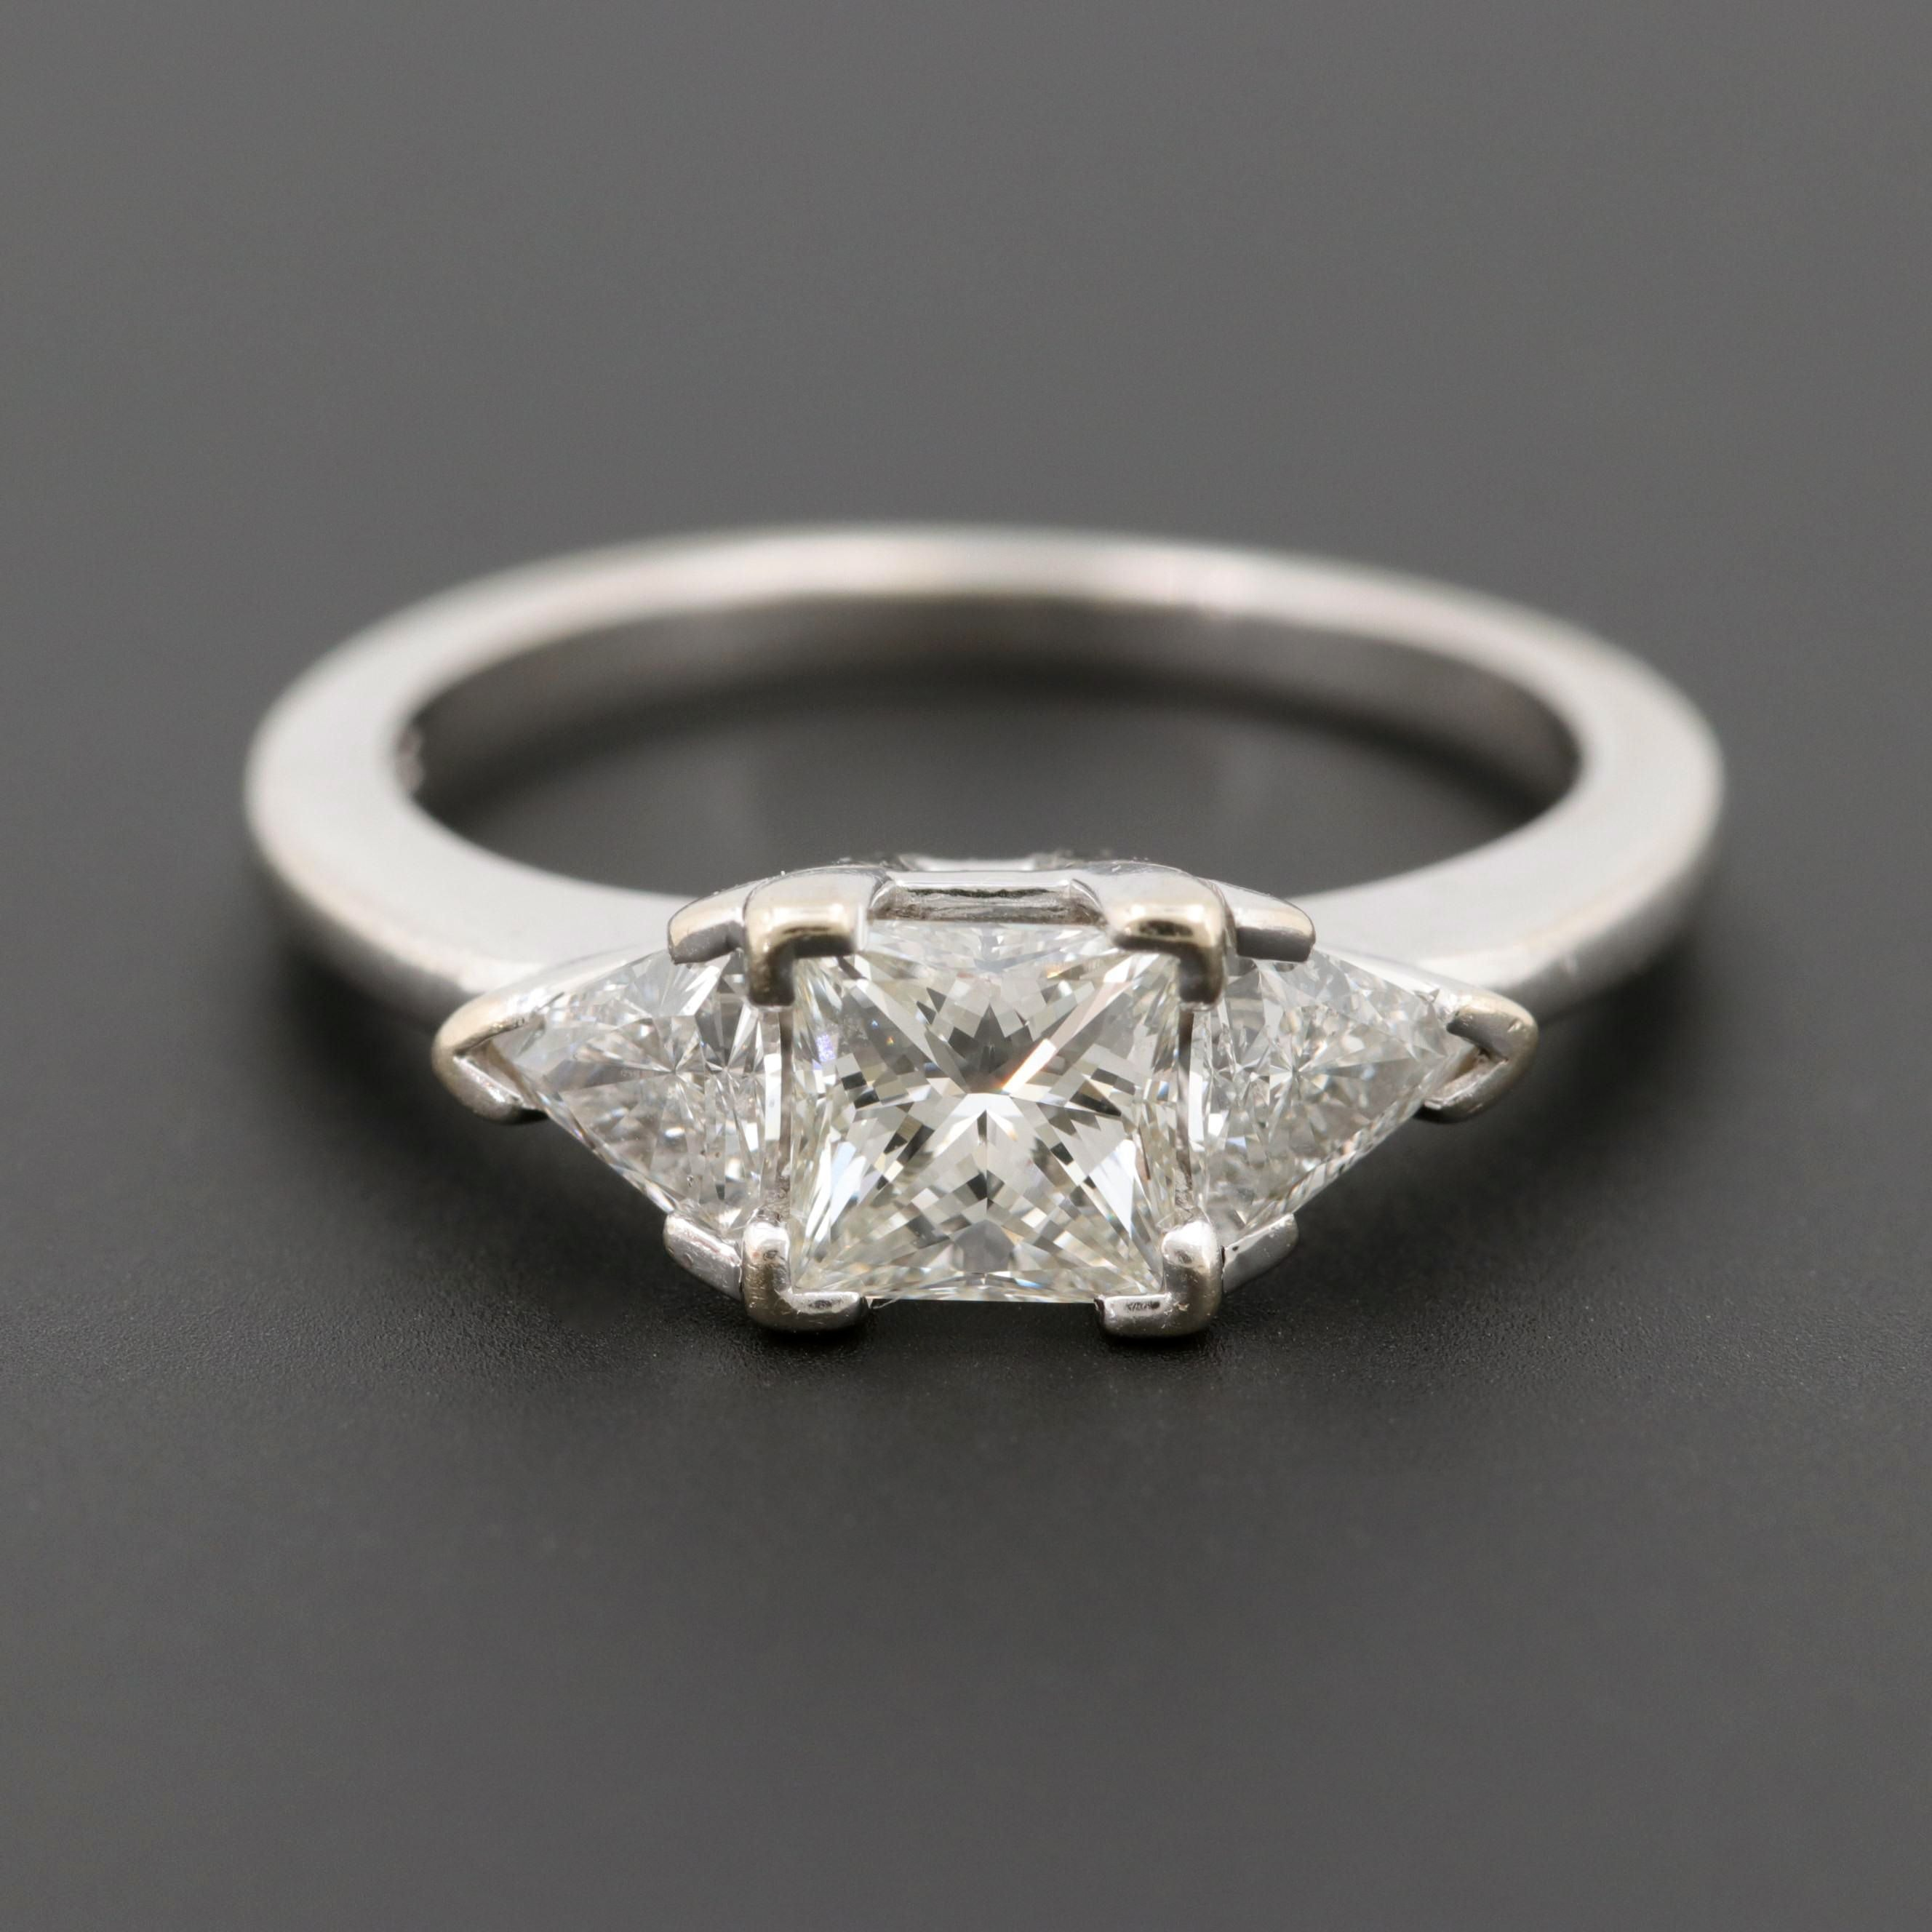 "14K White Gold 1.21 CTW Diamond Ring with Center ""The Leo"" Diamond"